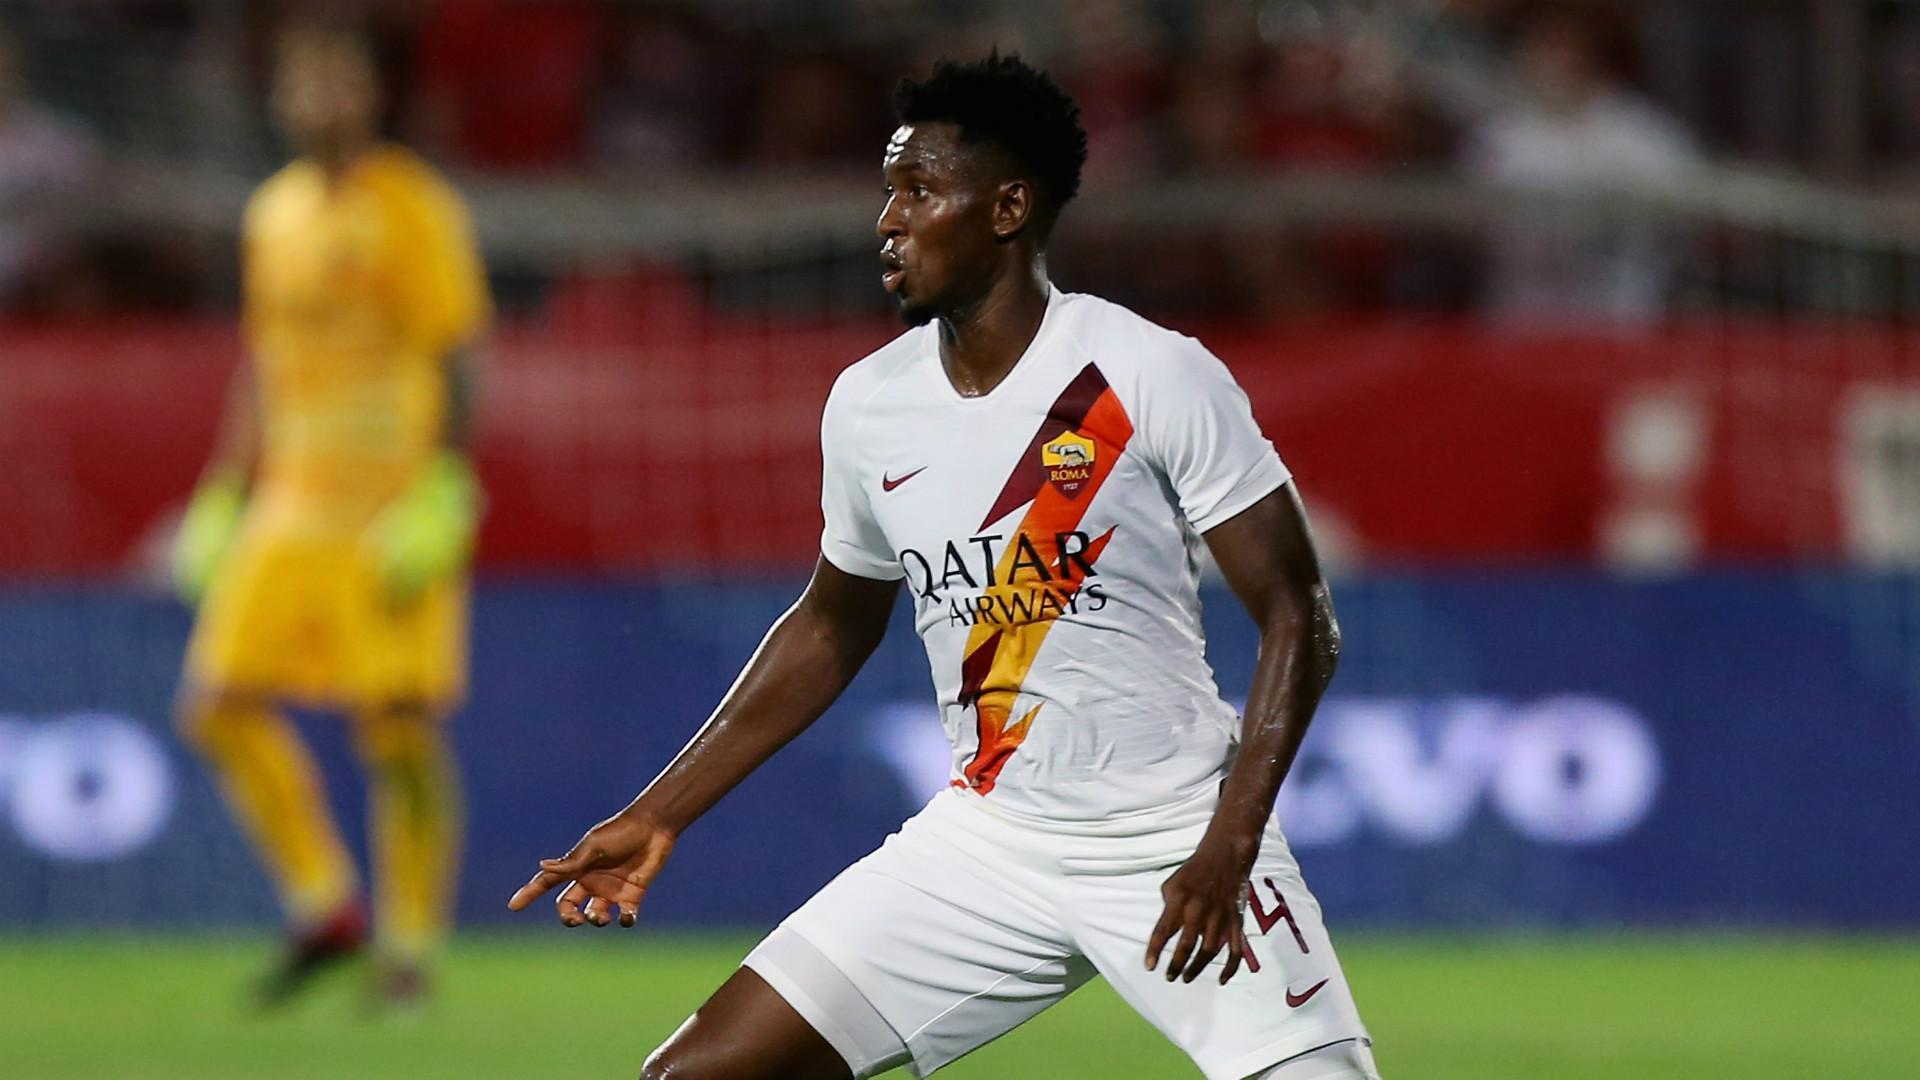 Roma's Amadou Diawara names ex-Manchester City midfielder Yaya Toure as role model